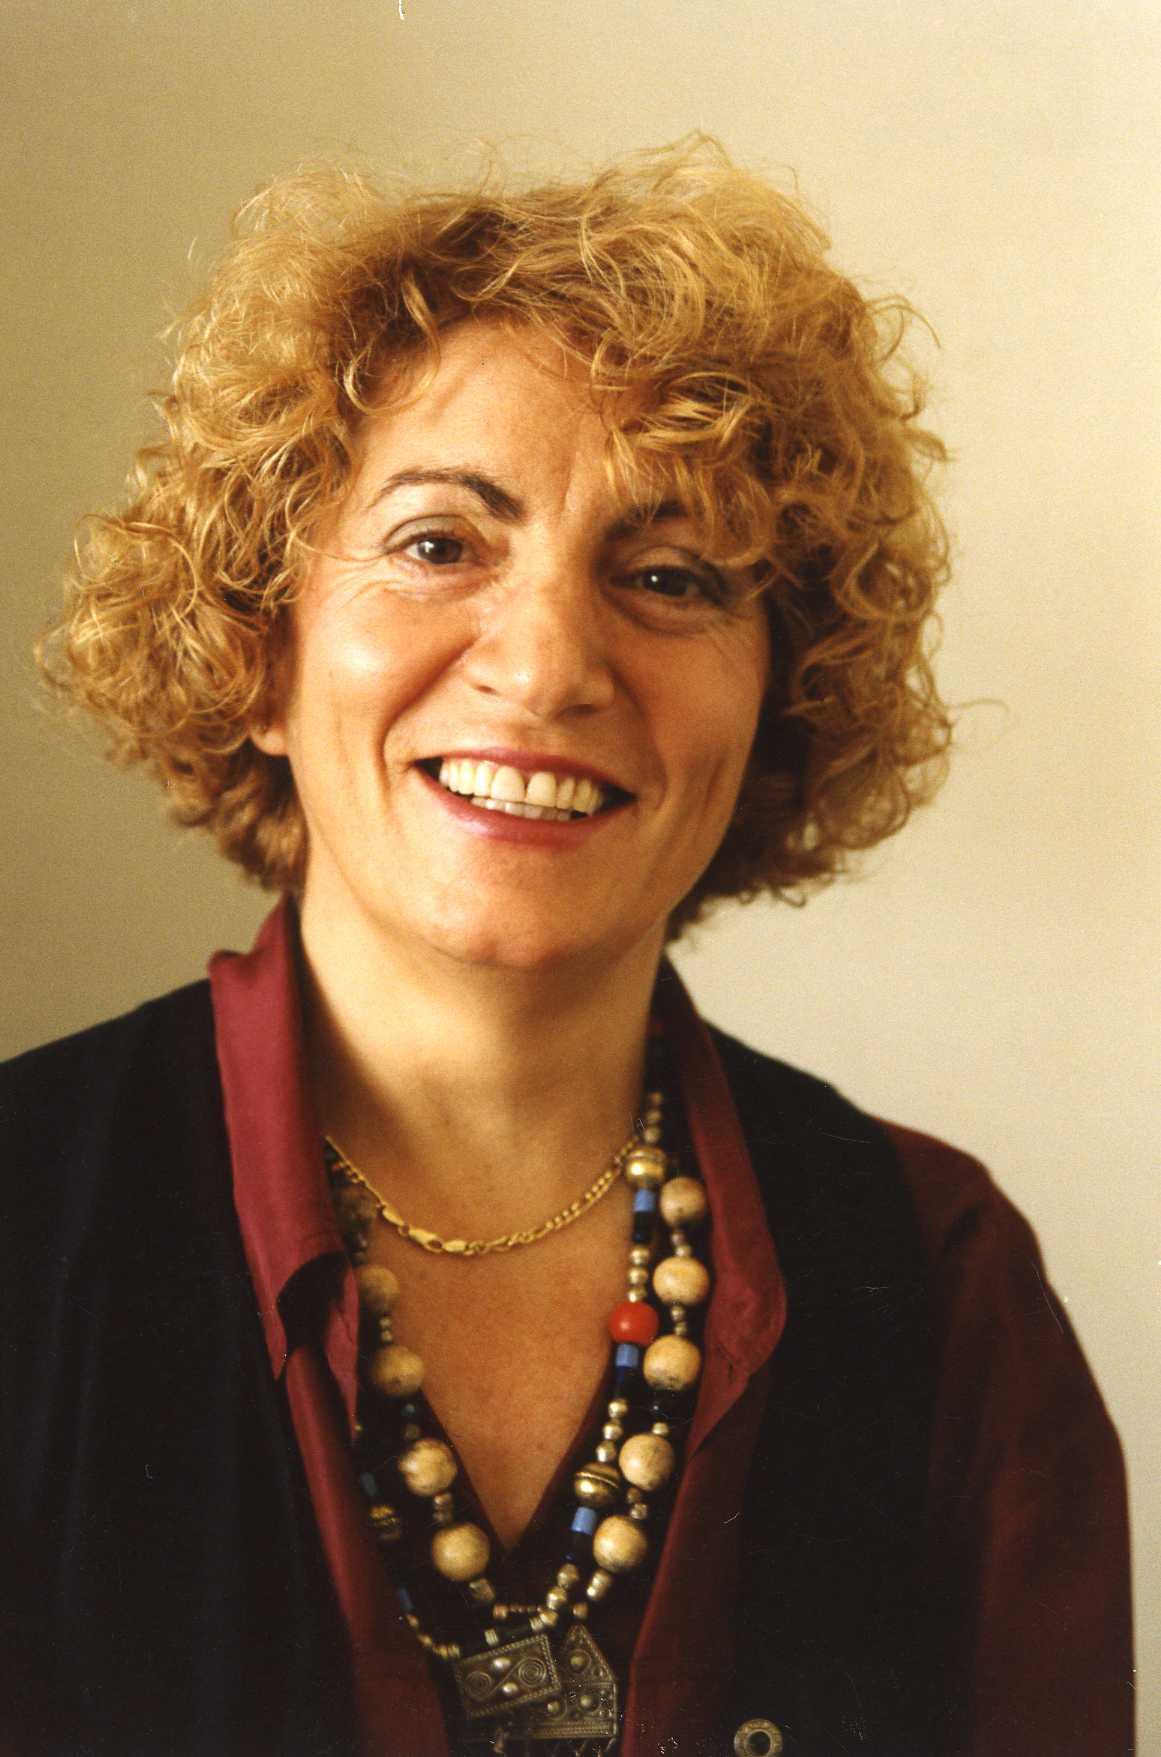 Leyla Assaf-Tengroth